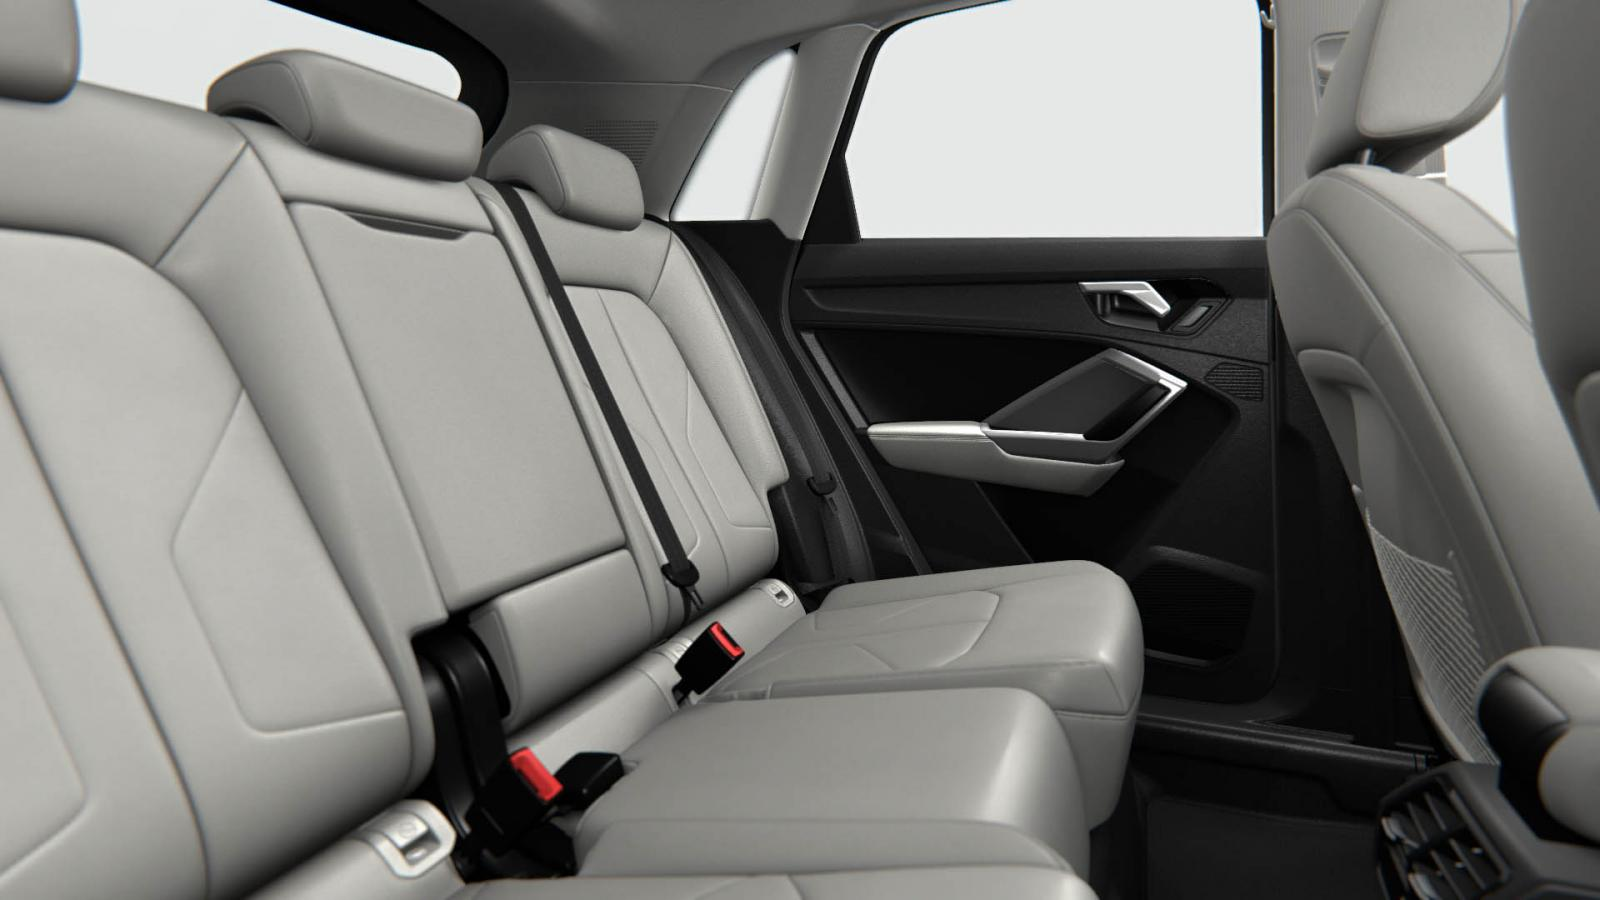 La Audi Q3 S Line tiene buen espacio